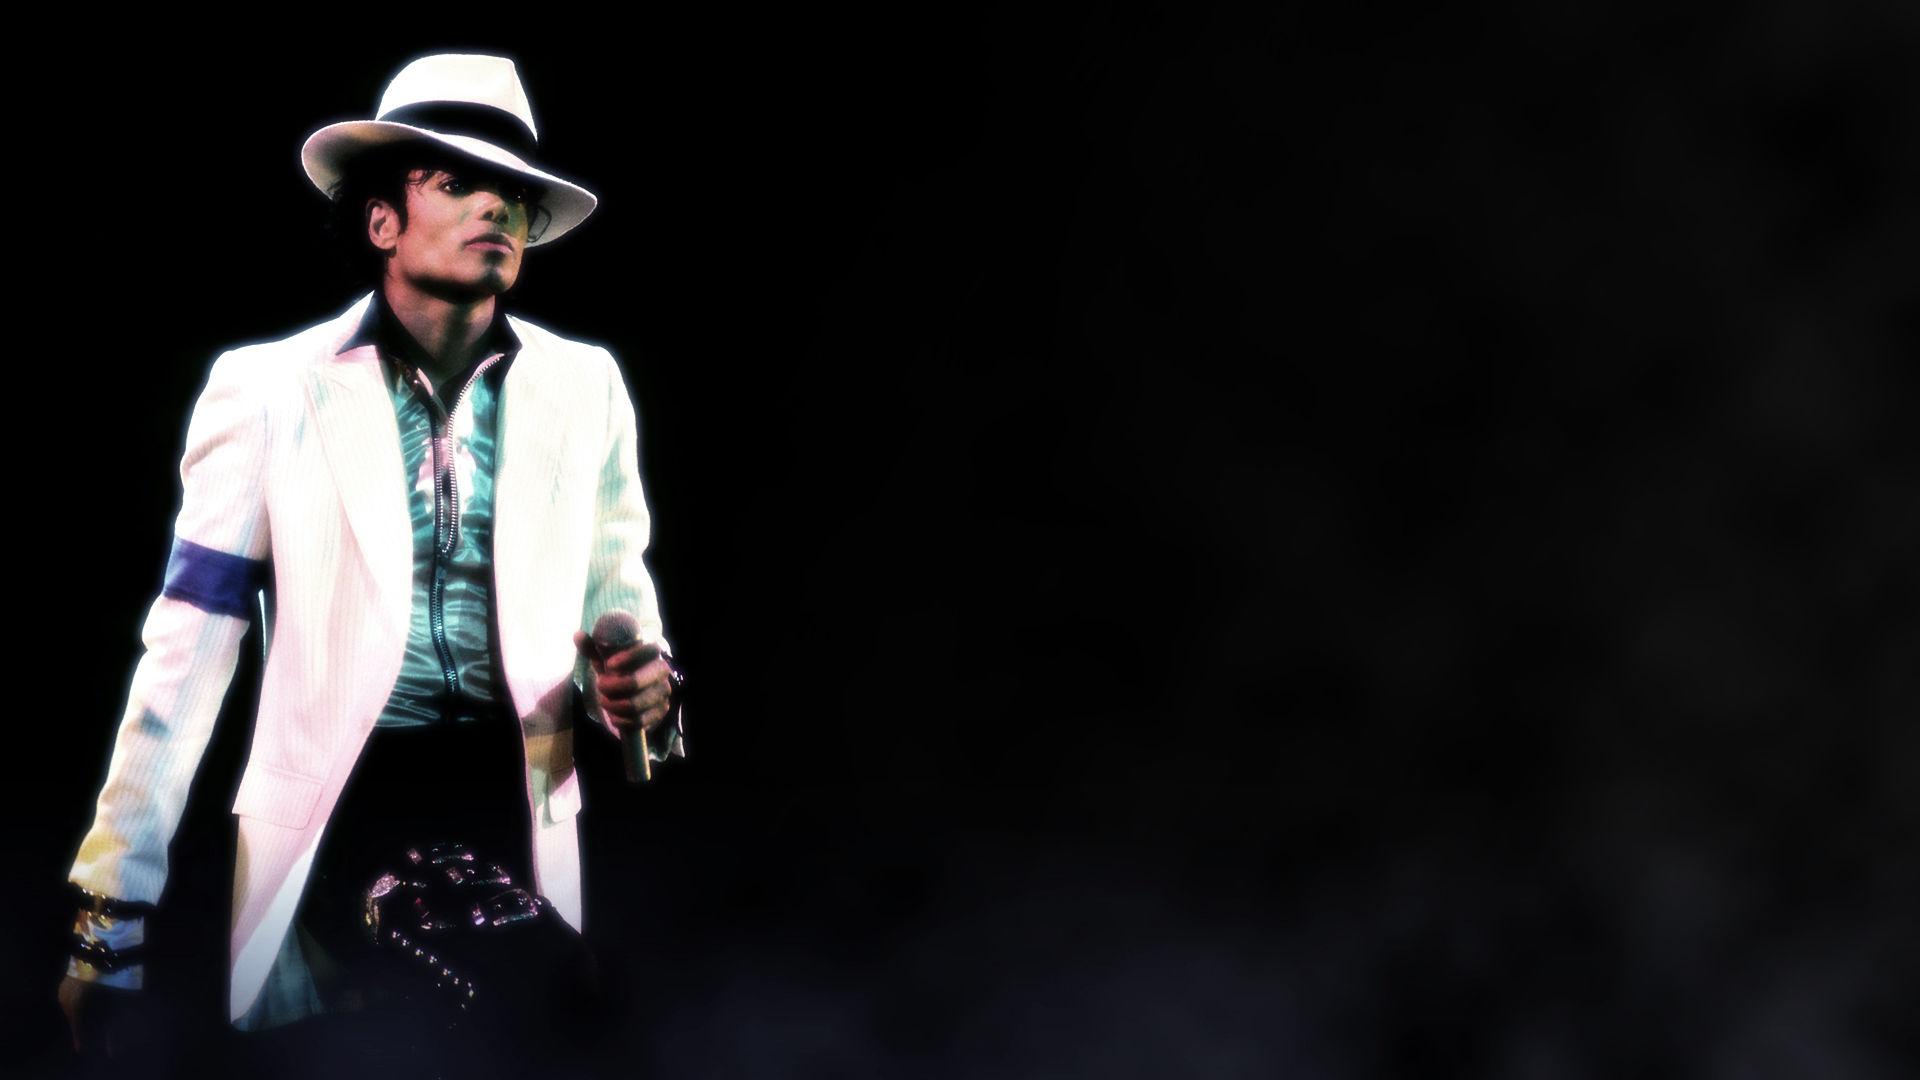 Michael Jackson Wallpaper 048